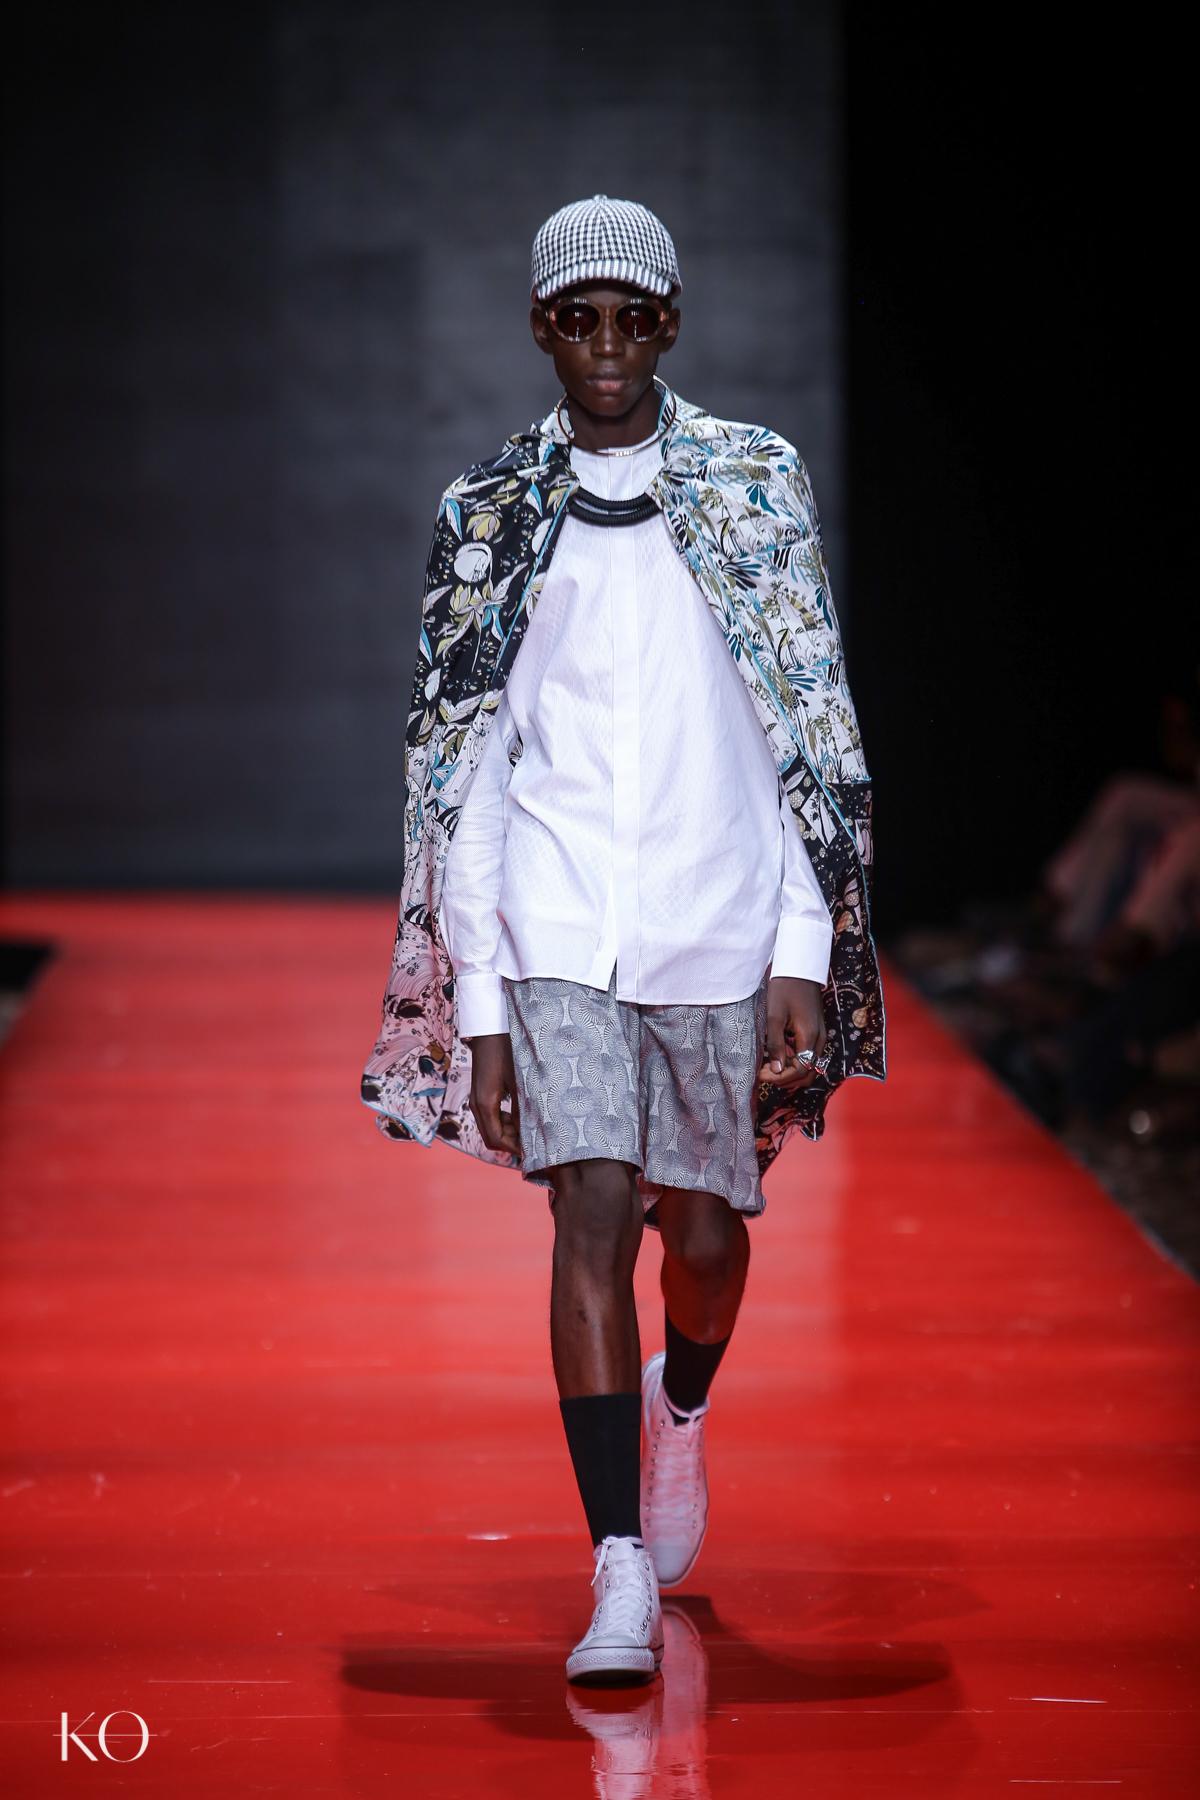 Full arise fashion week 2018 ozwald boateng 14